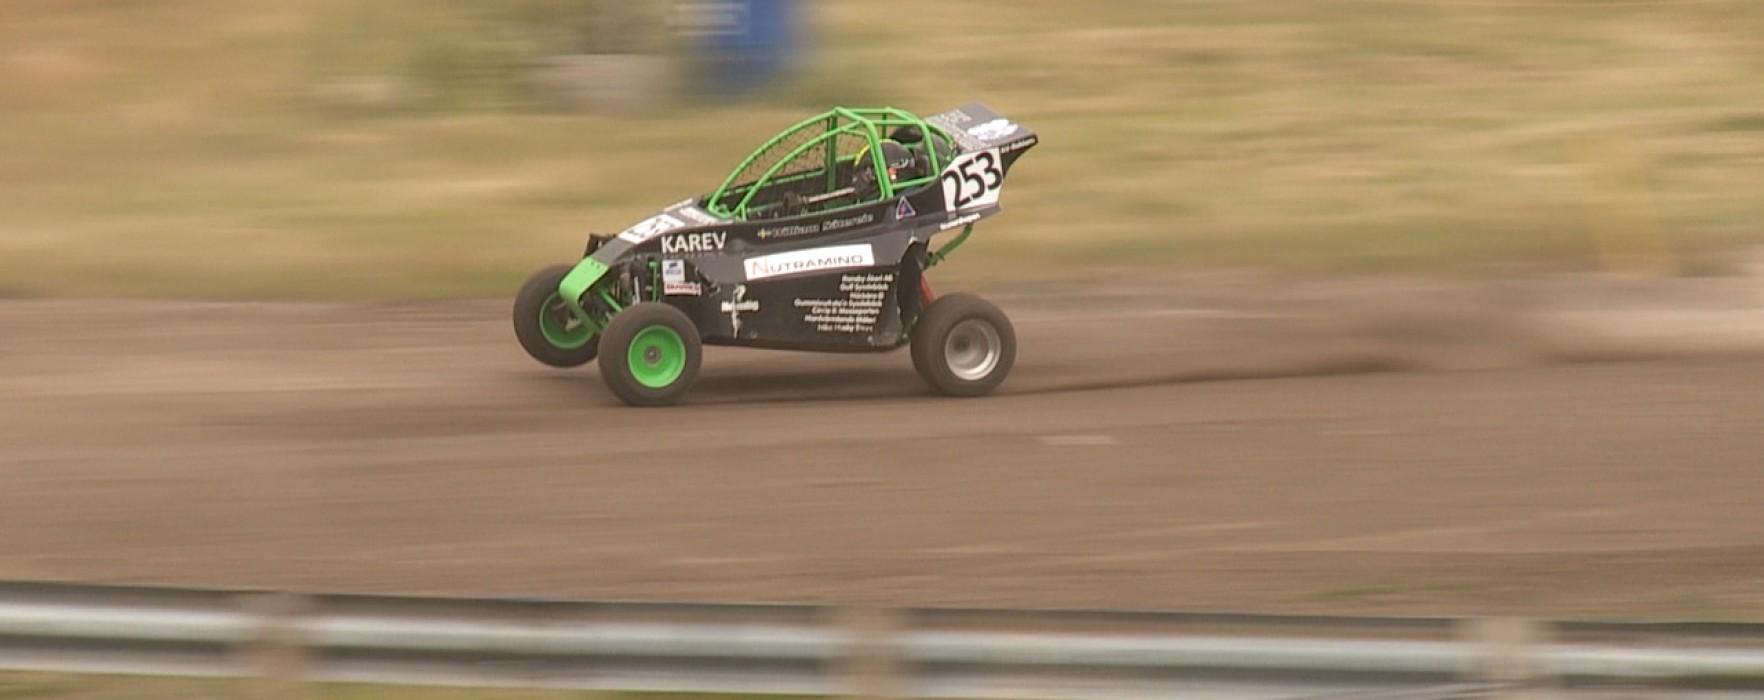 Glimt Sport – Crosskart-SM i Karlstad